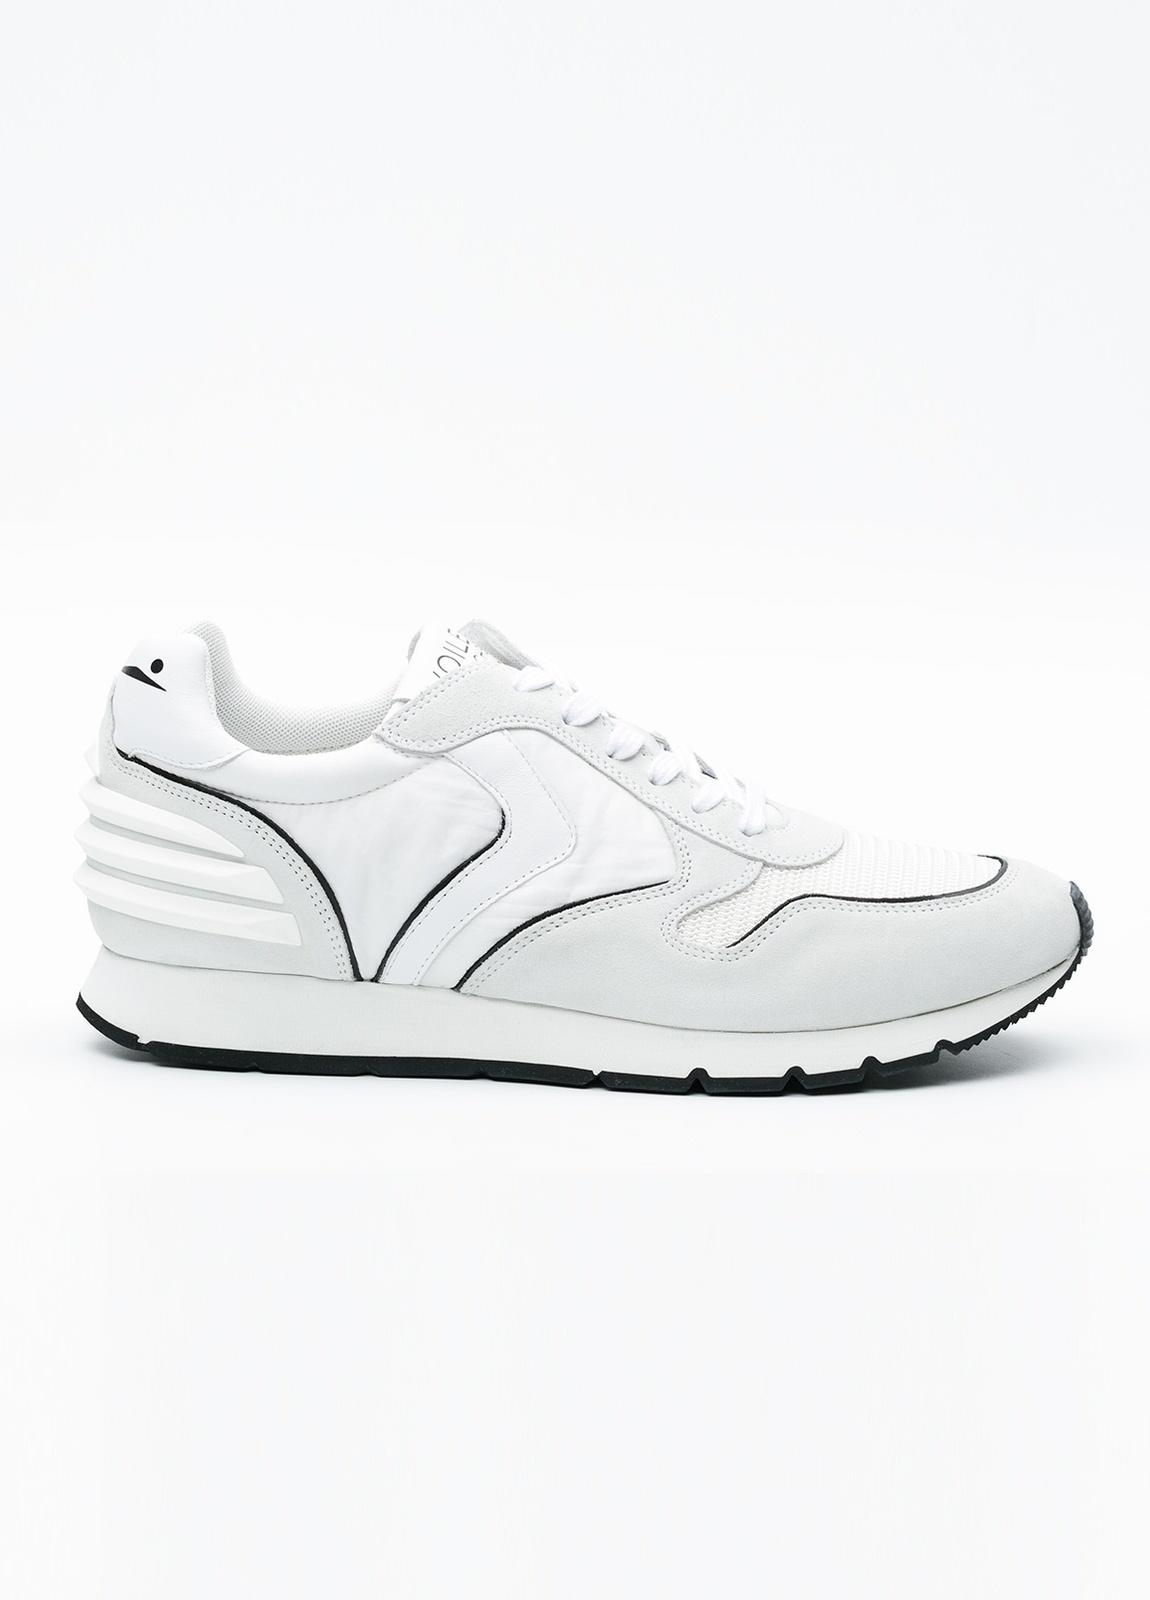 Bambas moda hombre modelo LIAM POWER color blanco.